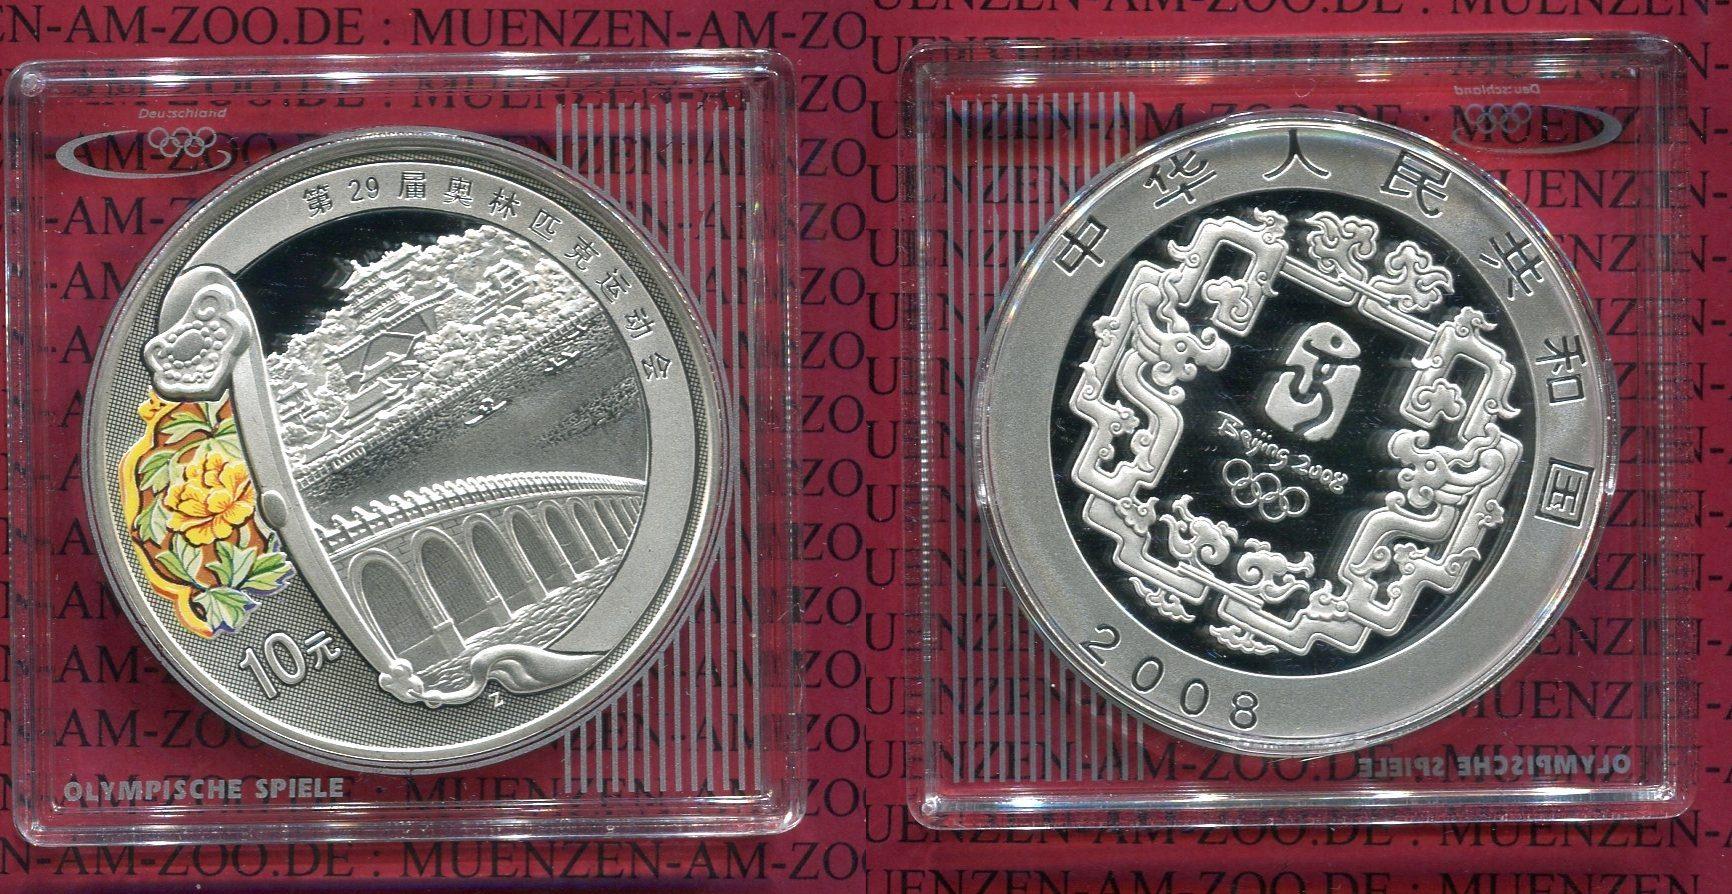 10 Yuan Silbermünze Farbmünze 2008 China Olympische Spiele Peking